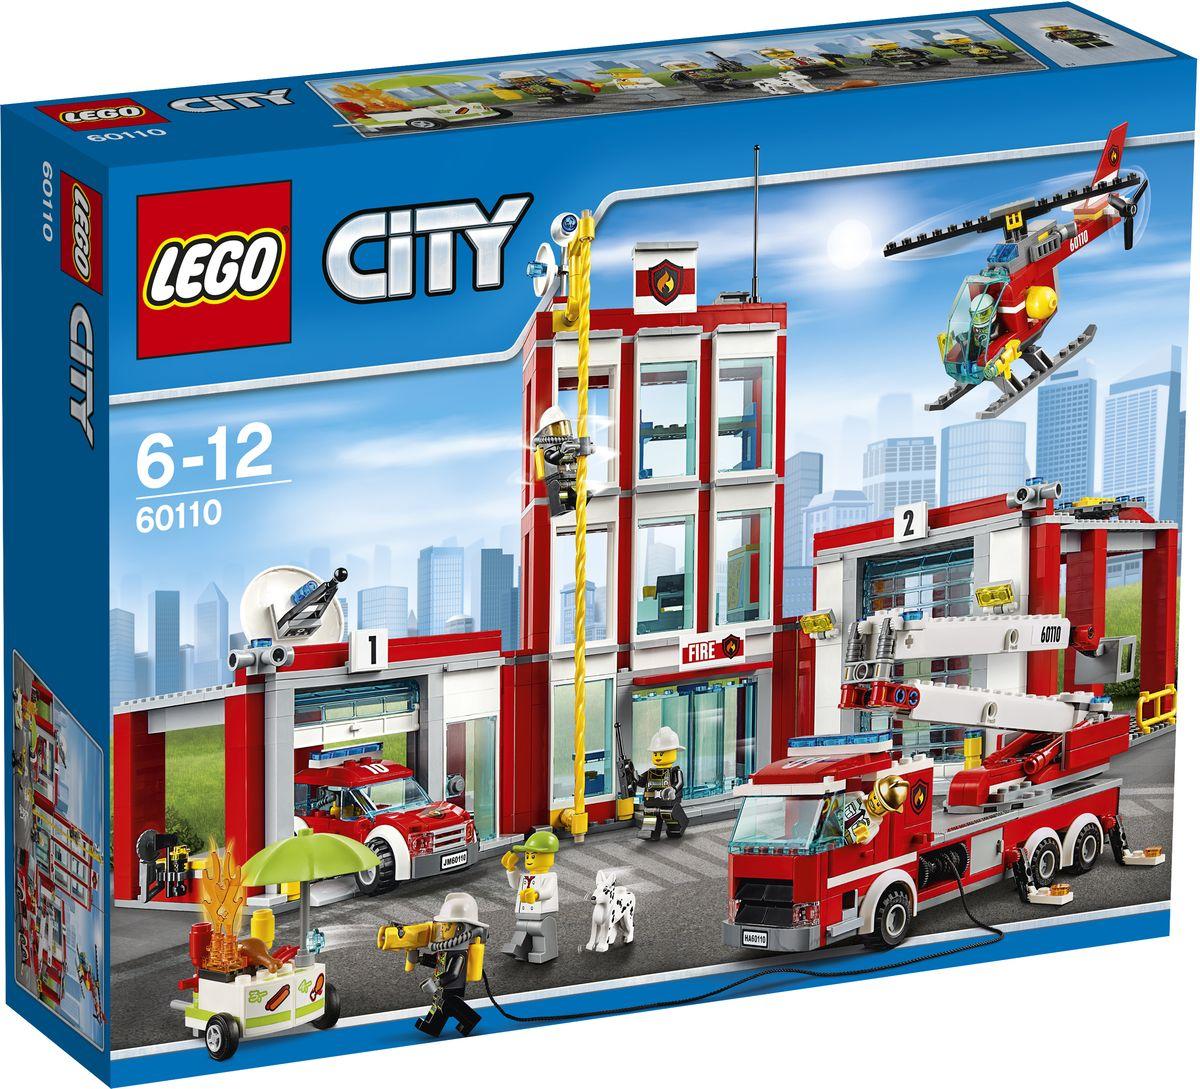 LEGO City Конструктор Пожарная часть 60110 lego friends 41129 конструктор парк развлечений фургон с хот догами